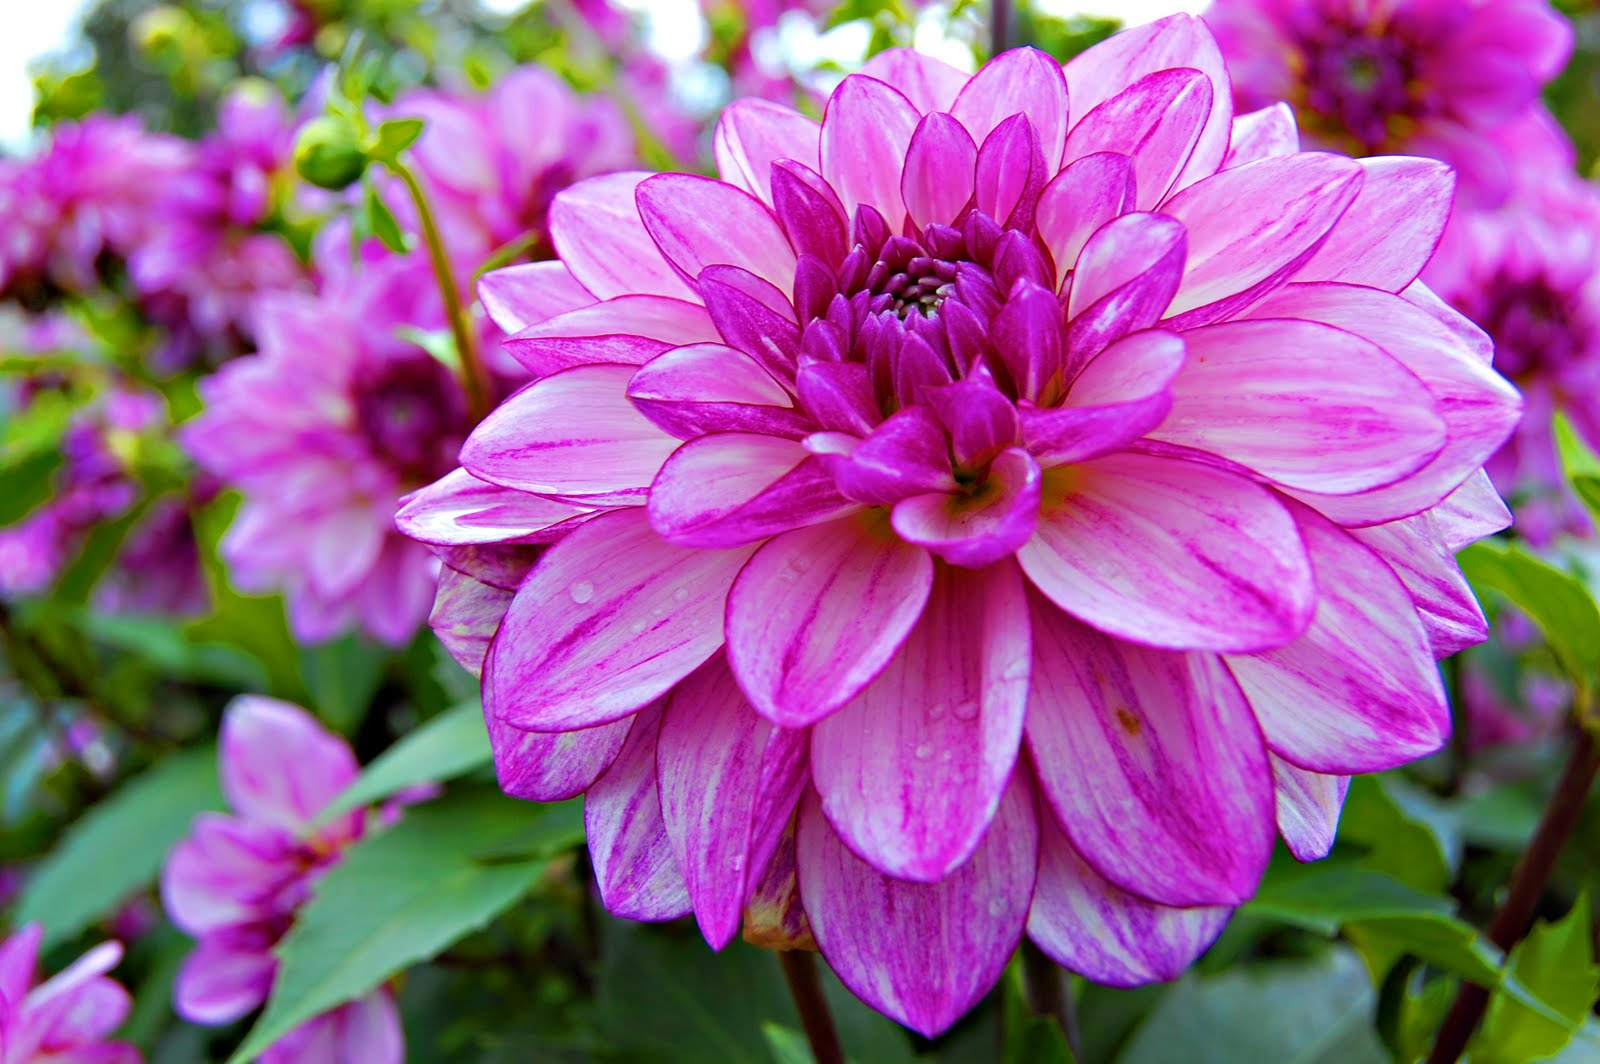 Fondos De Pantalla De Flores Hermosas Para Fondo Celular: Fondo De Pantalla Flores Fondos De Pantalla Flores Taringa